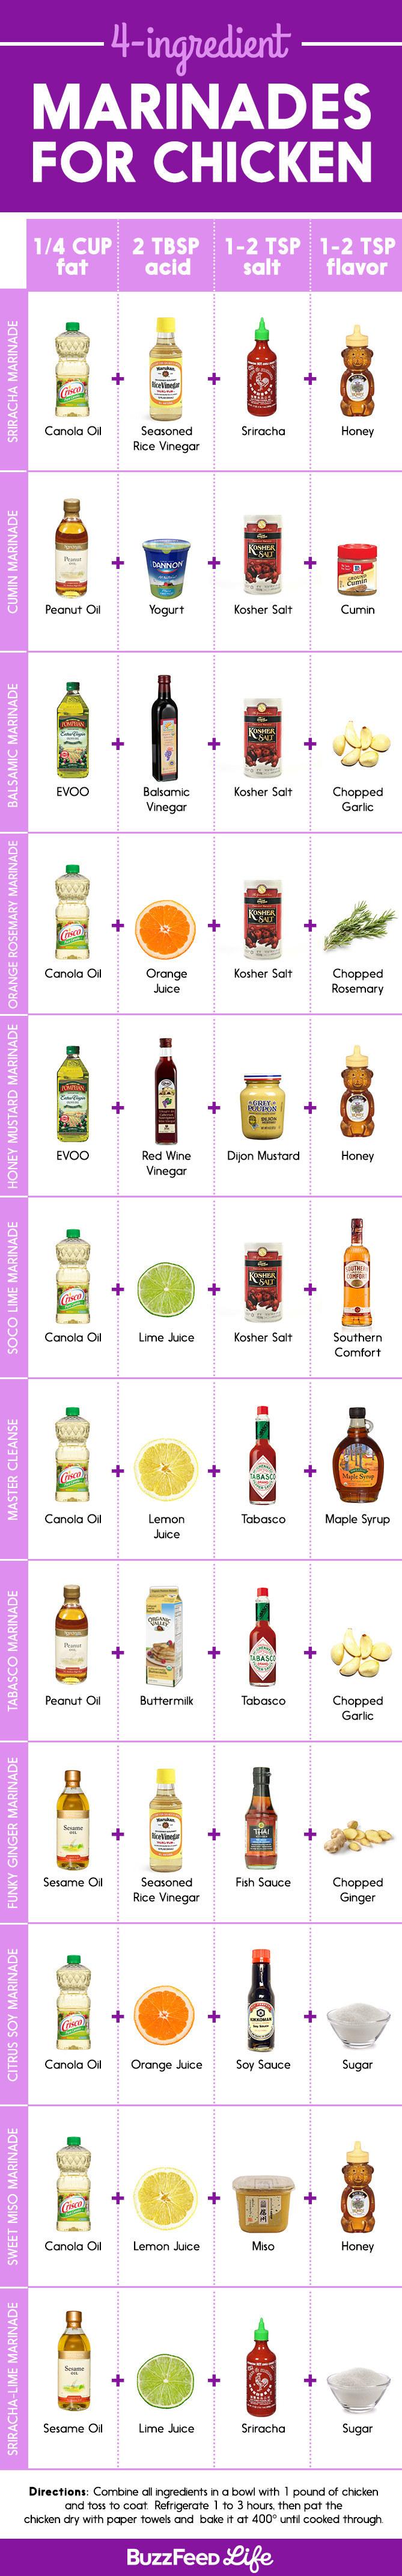 31 Sensational Chicken Marinades That'll Make Your Taste Buds Dance! - Infographic